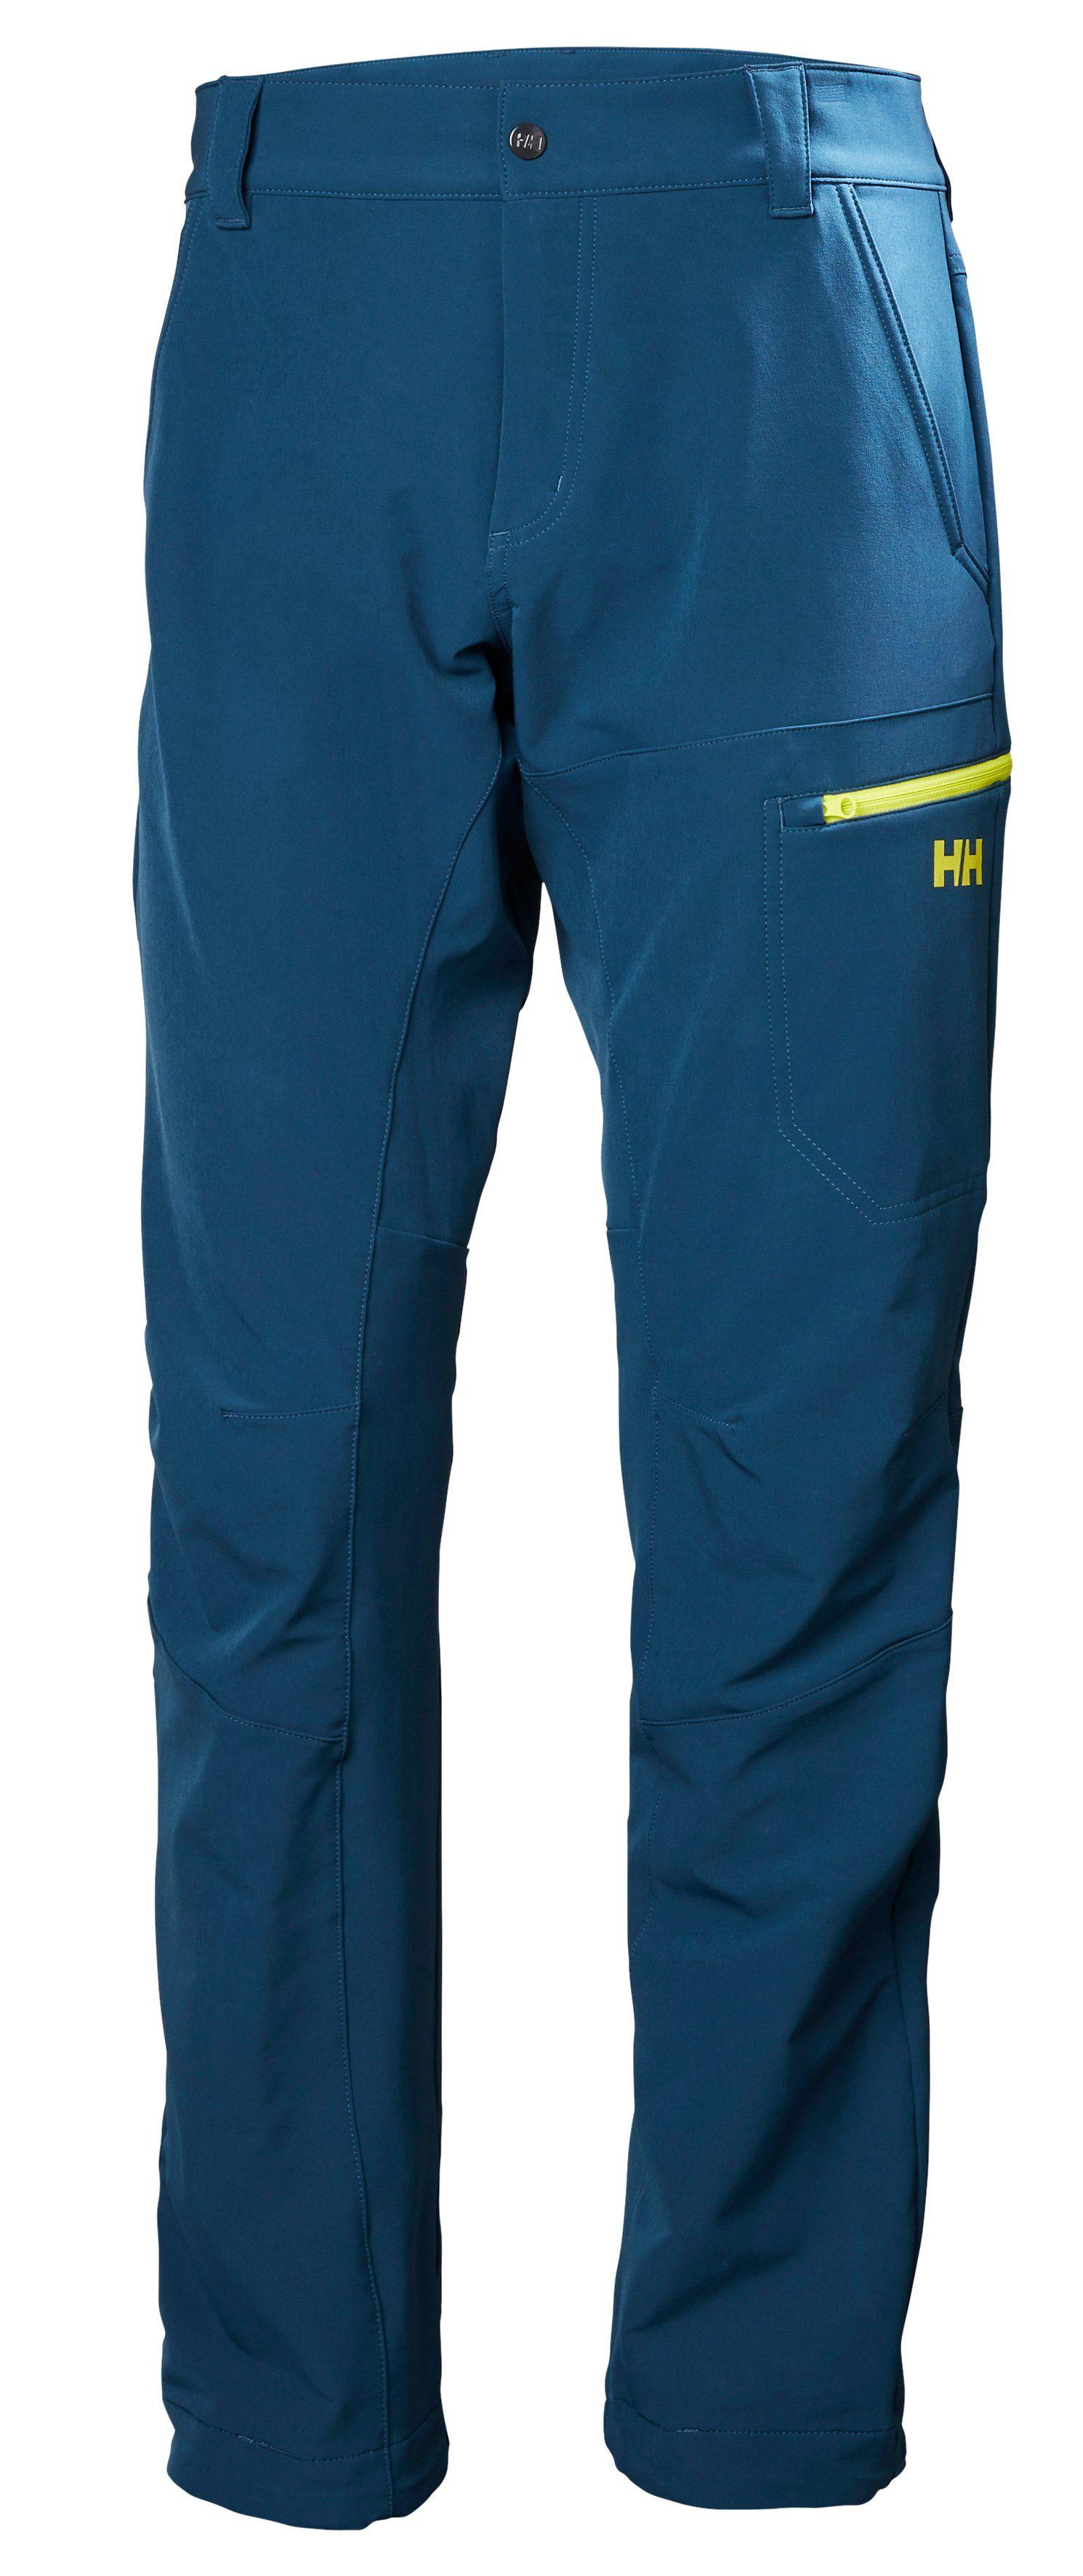 Helly Hansen Vanir Brono Pant   Sportbekleidung > Sporthosen > Softshellhosen   Grün   Polyester   HELLY HANSEN